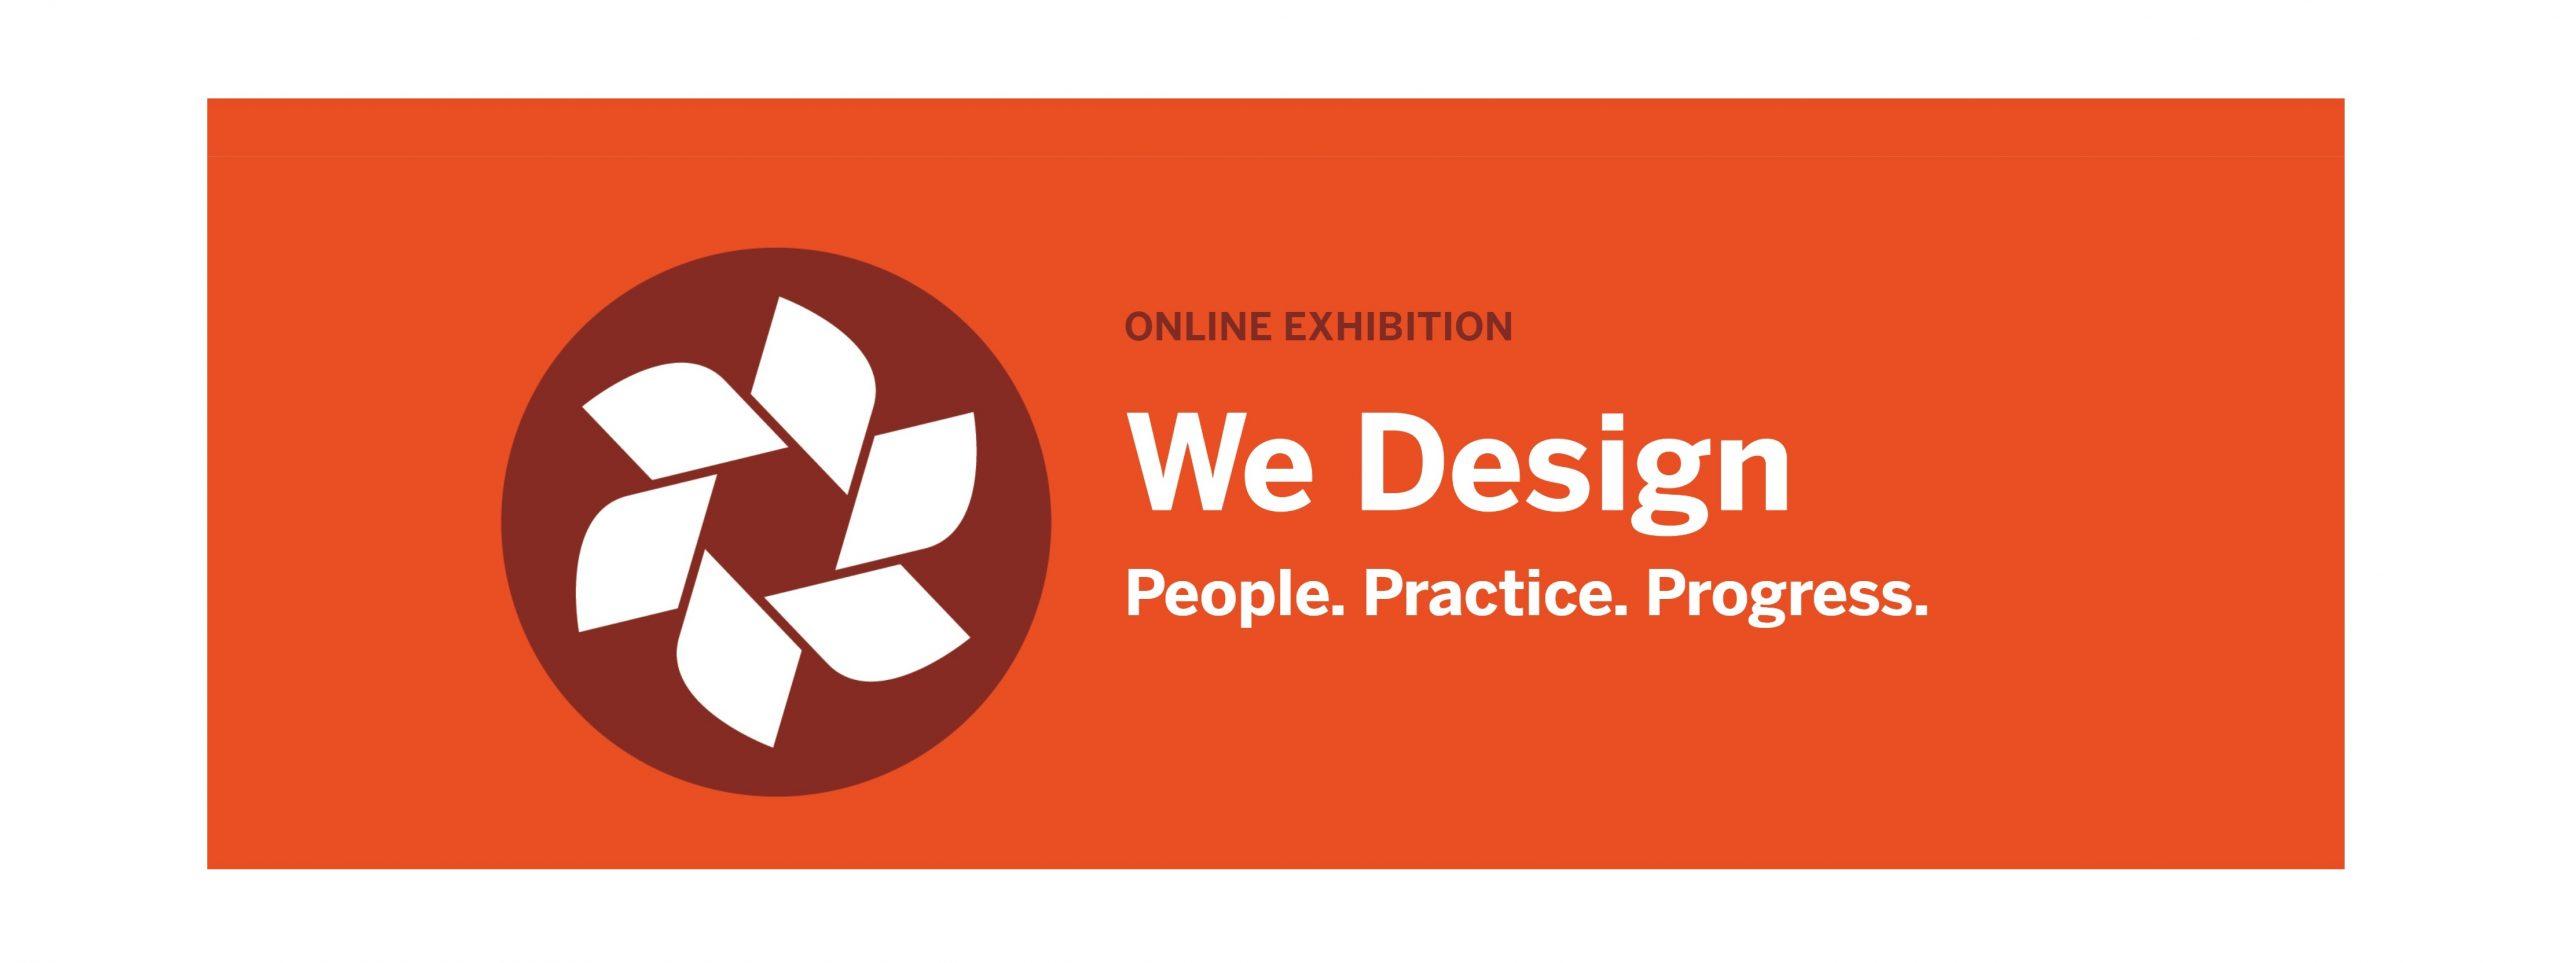 We design people f